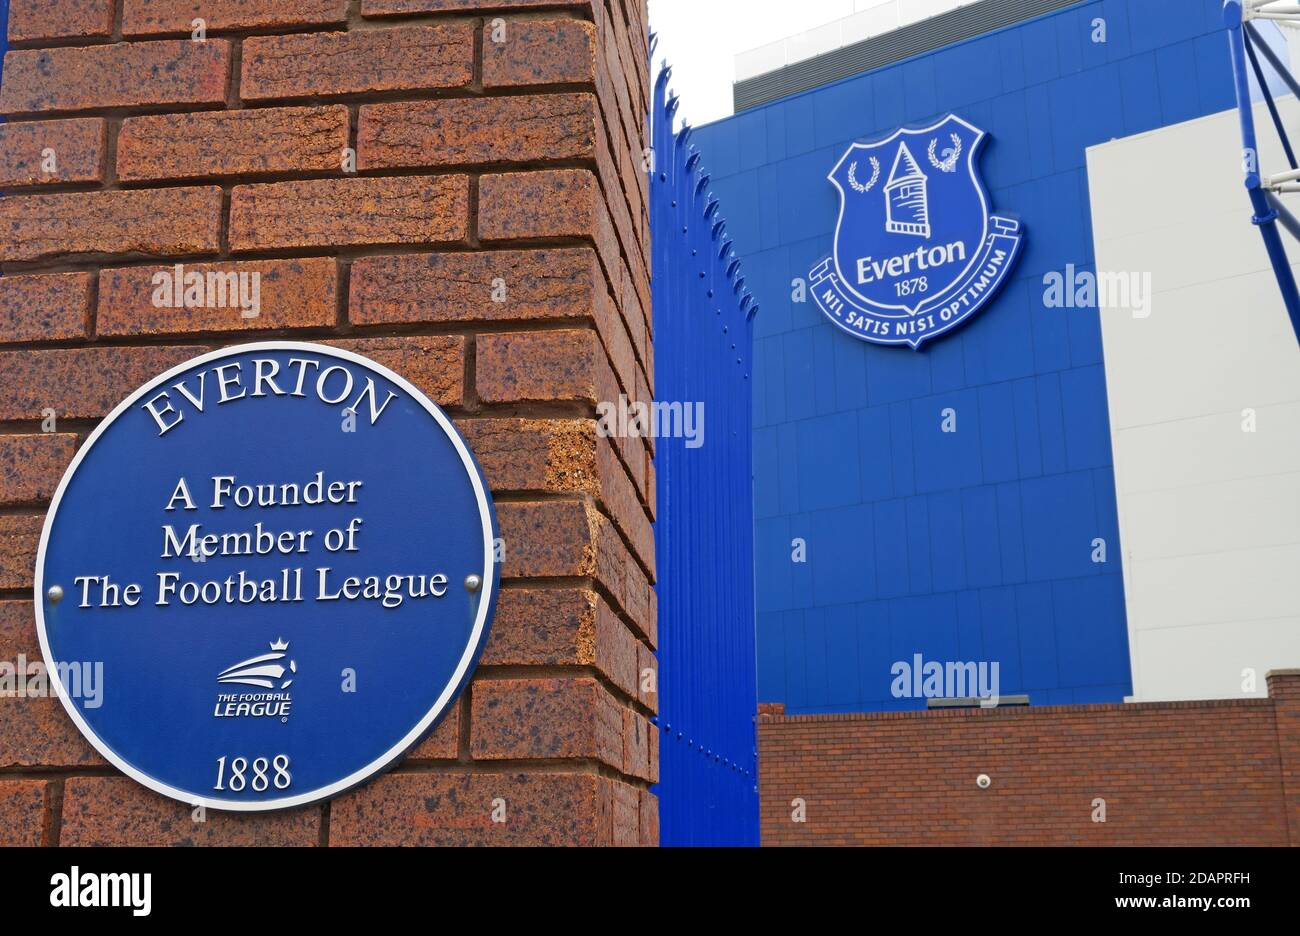 Hotpixuk,@Hotpixuk,GoTonySmith,England,UK,GB,Great Britain,Goodison,Liverpool,Merseyside,Premier League,club,stadia,1888,L4,blue,blues,Everton,Founder Member,football league,blue plaque,sign,Nil satis nisi optimum